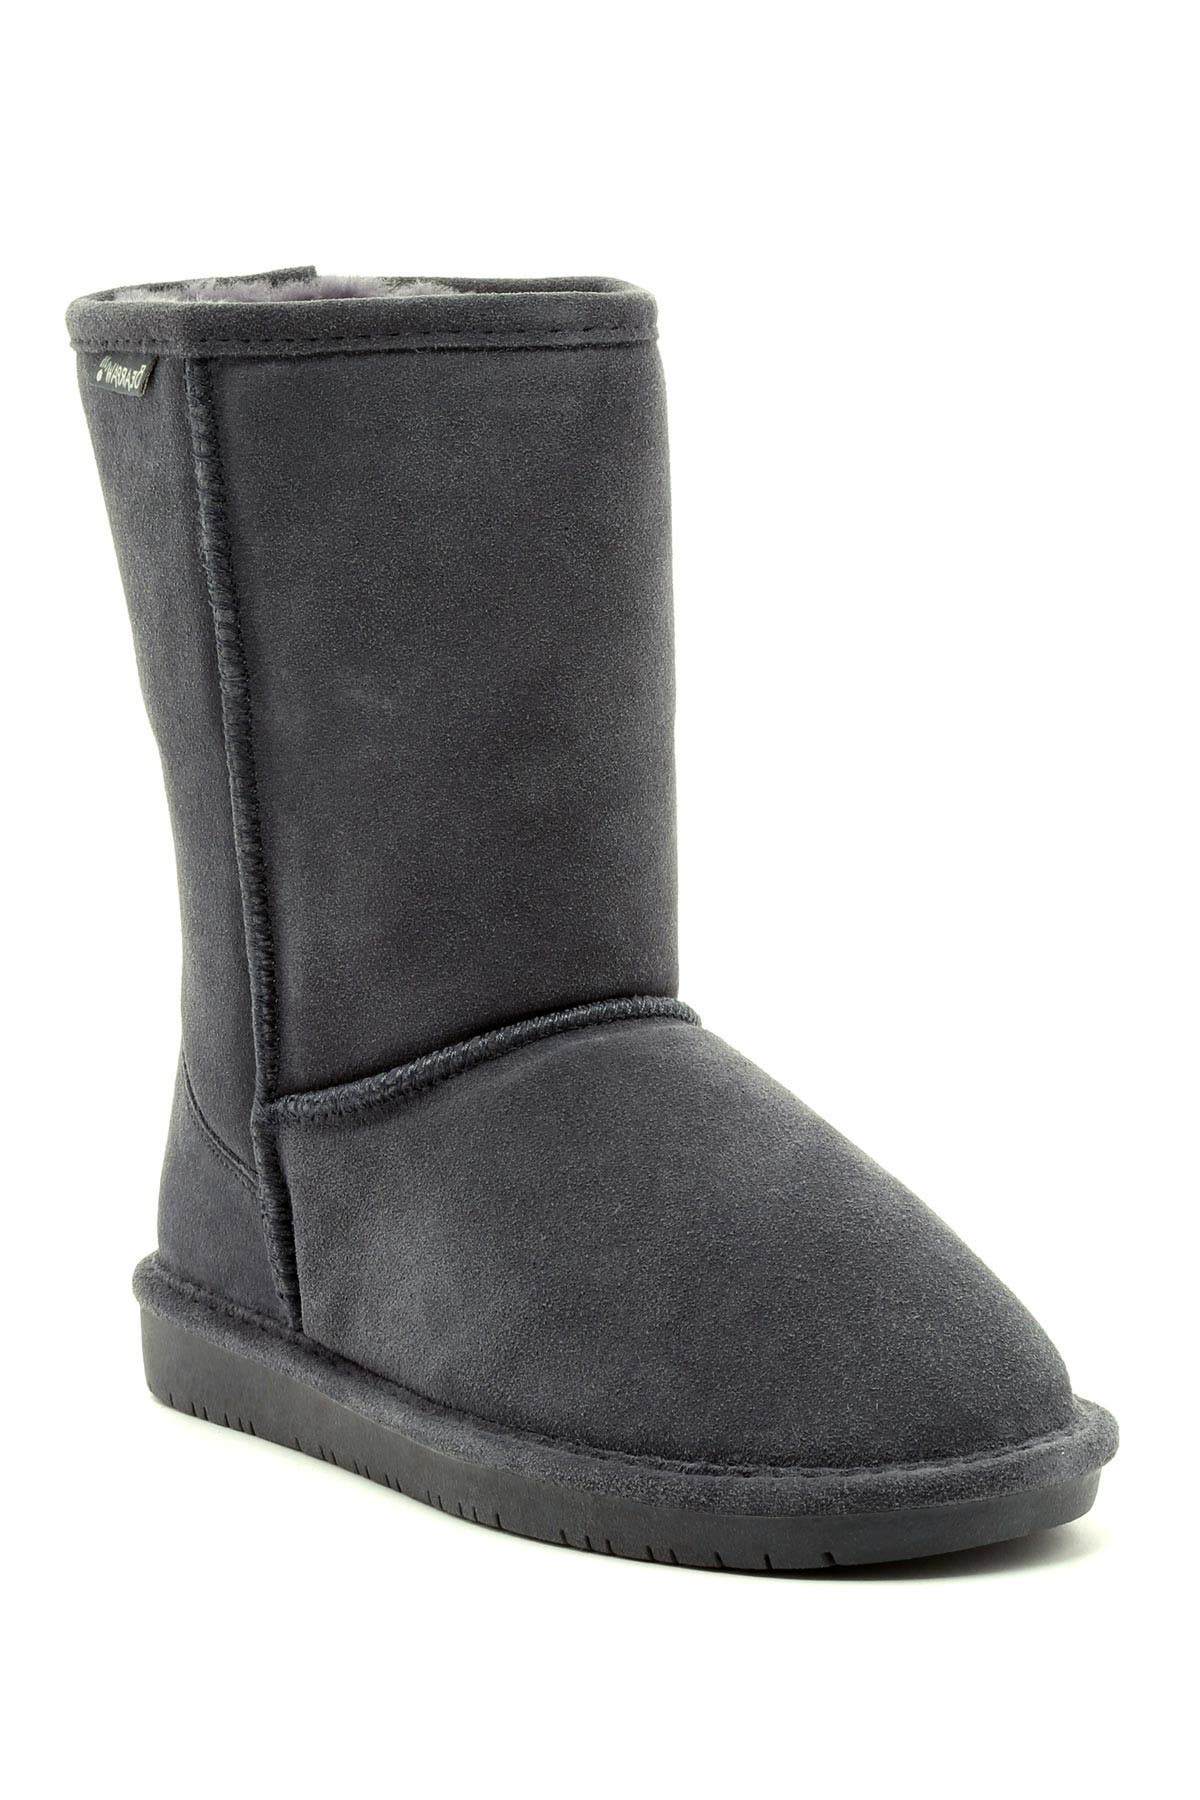 Image of BEARPAW Emma Short Genuine Sheepskin Lined Boot